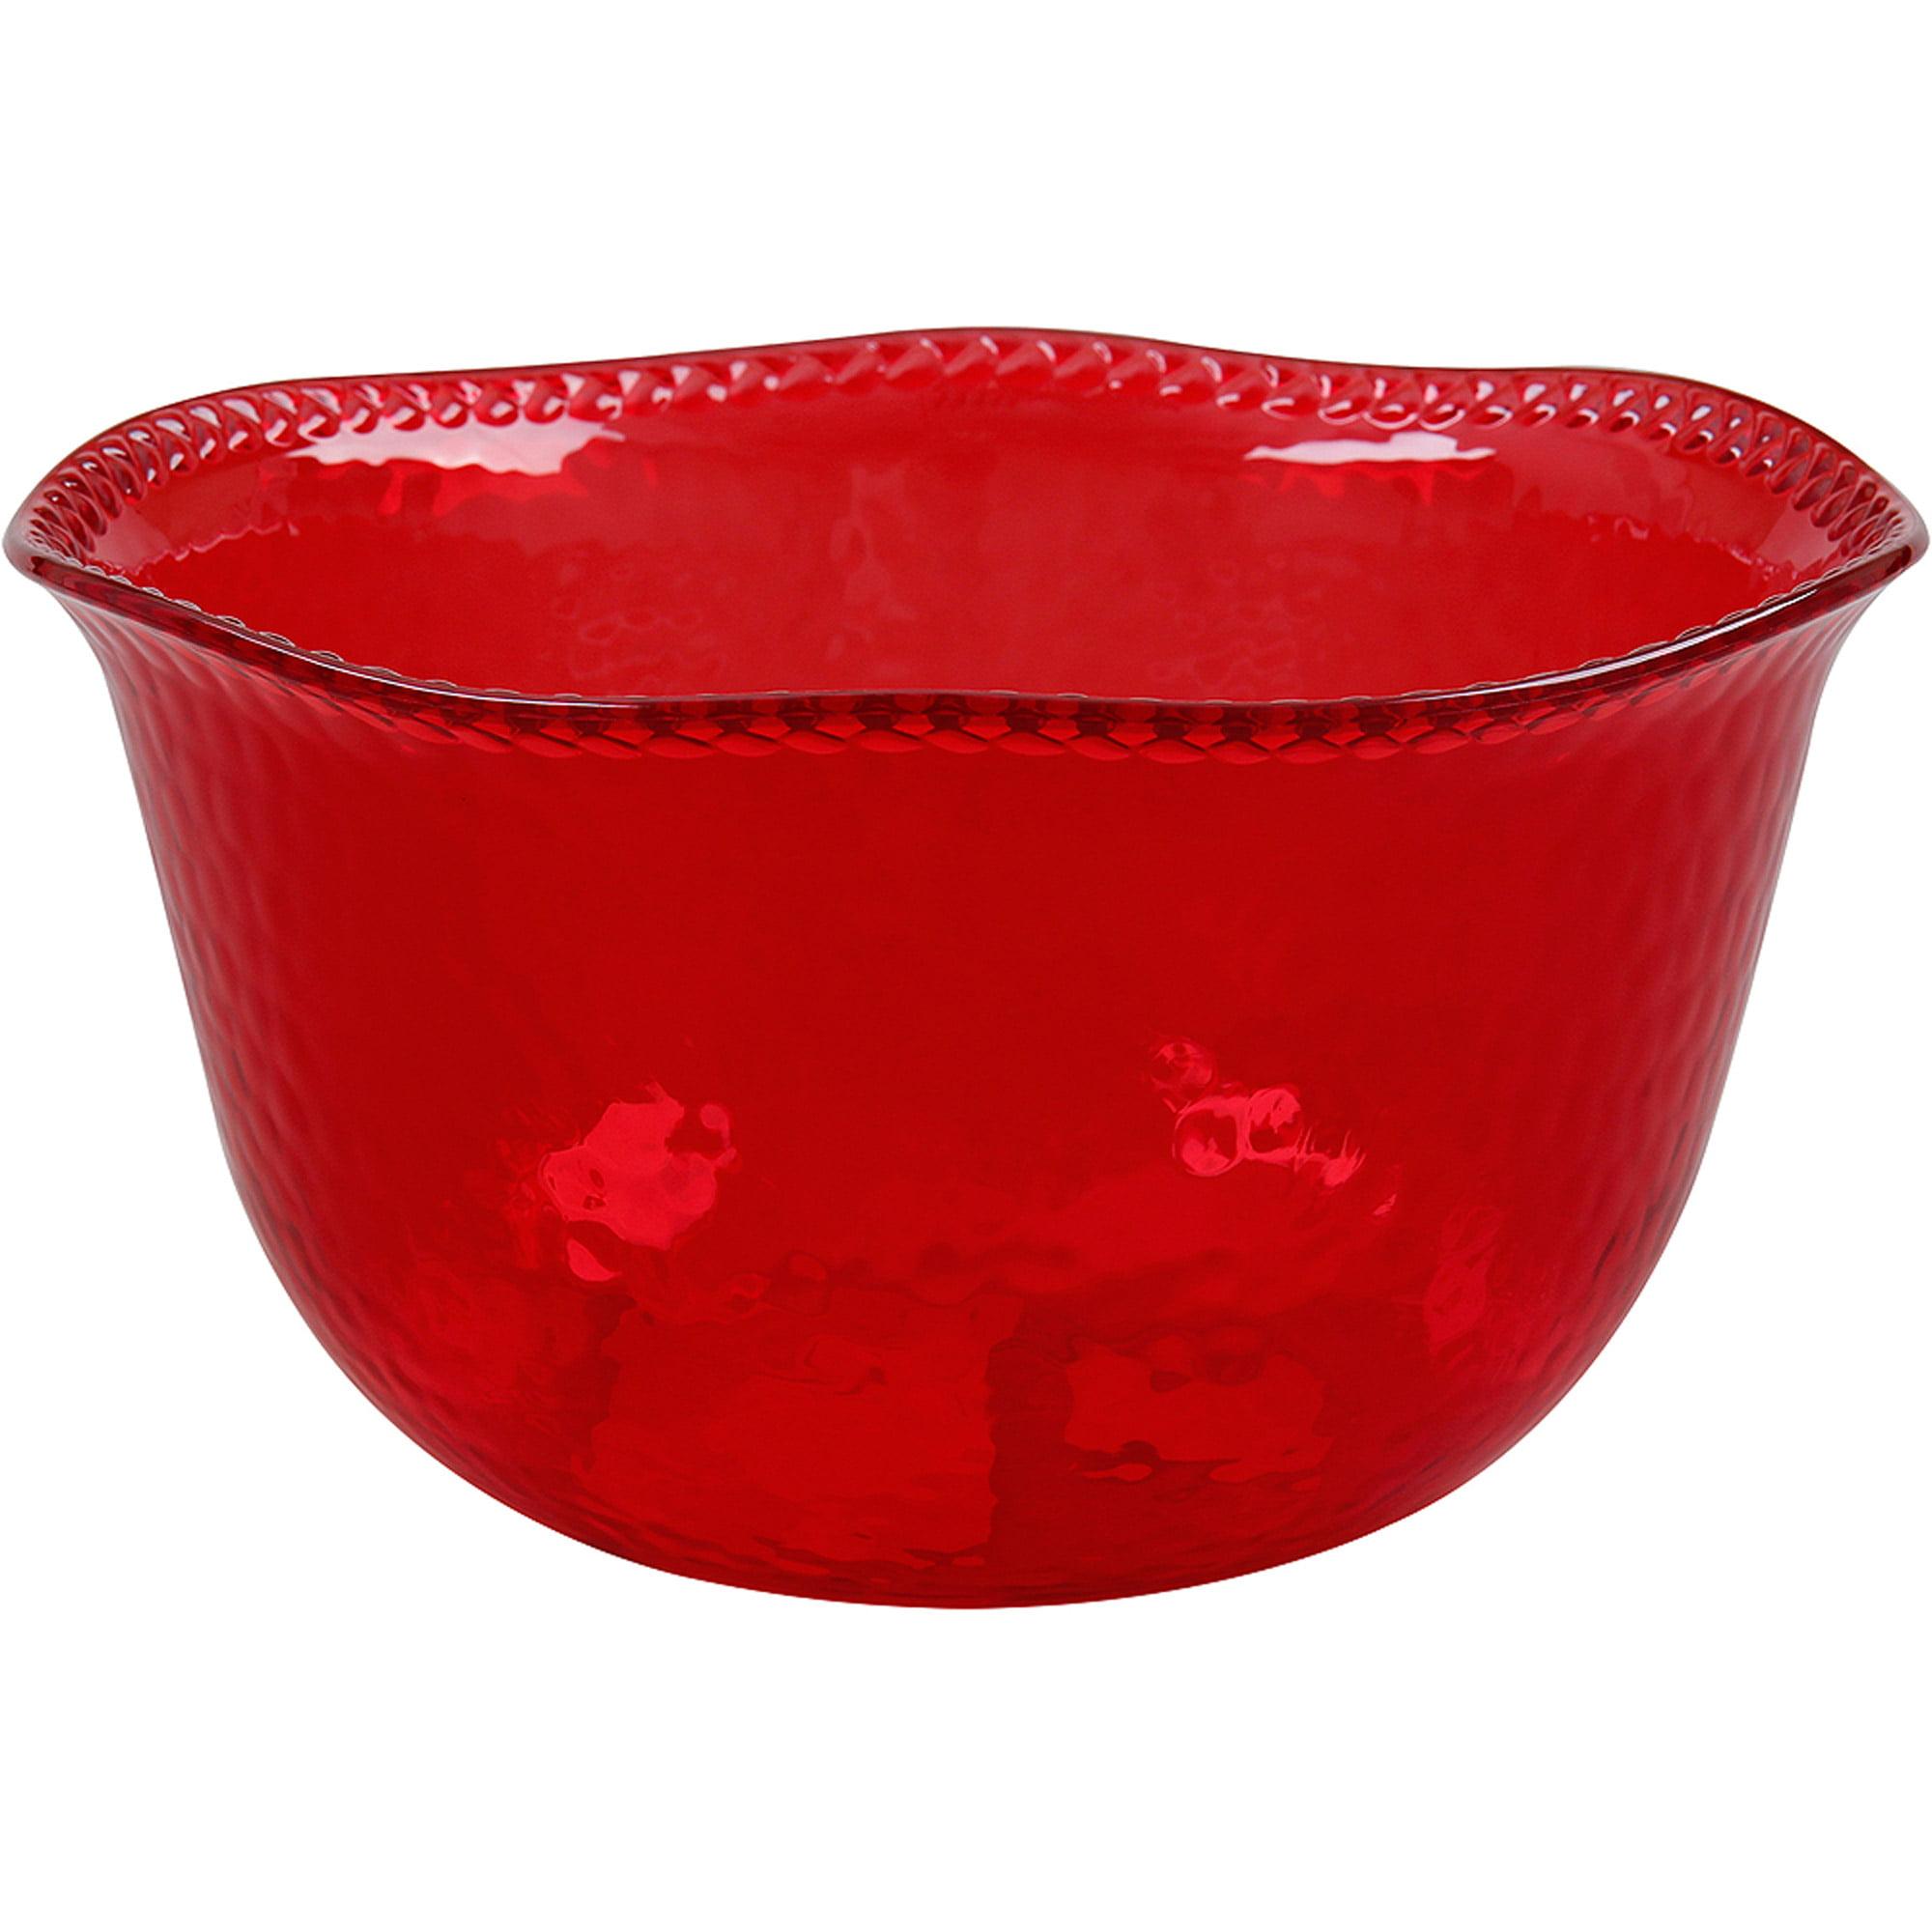 Better Homes & Gardens Clear Serve Bowls